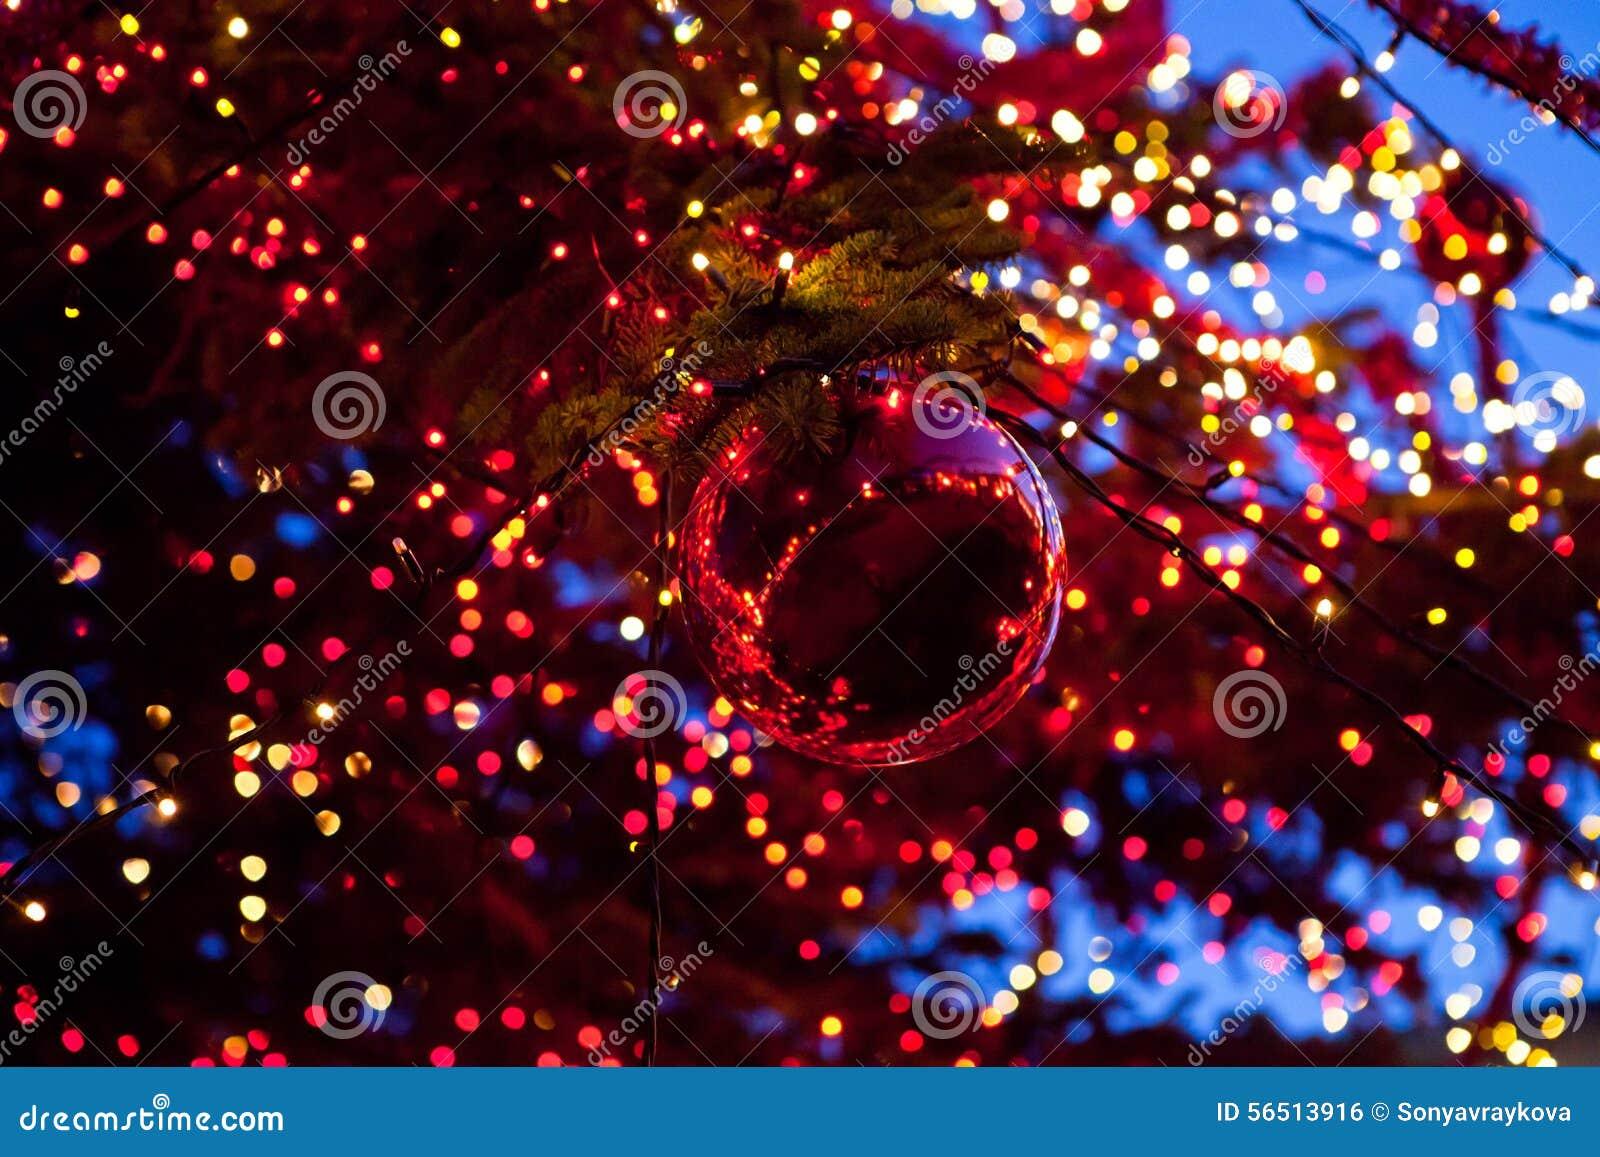 Christmas ball with ornament lights on a tree